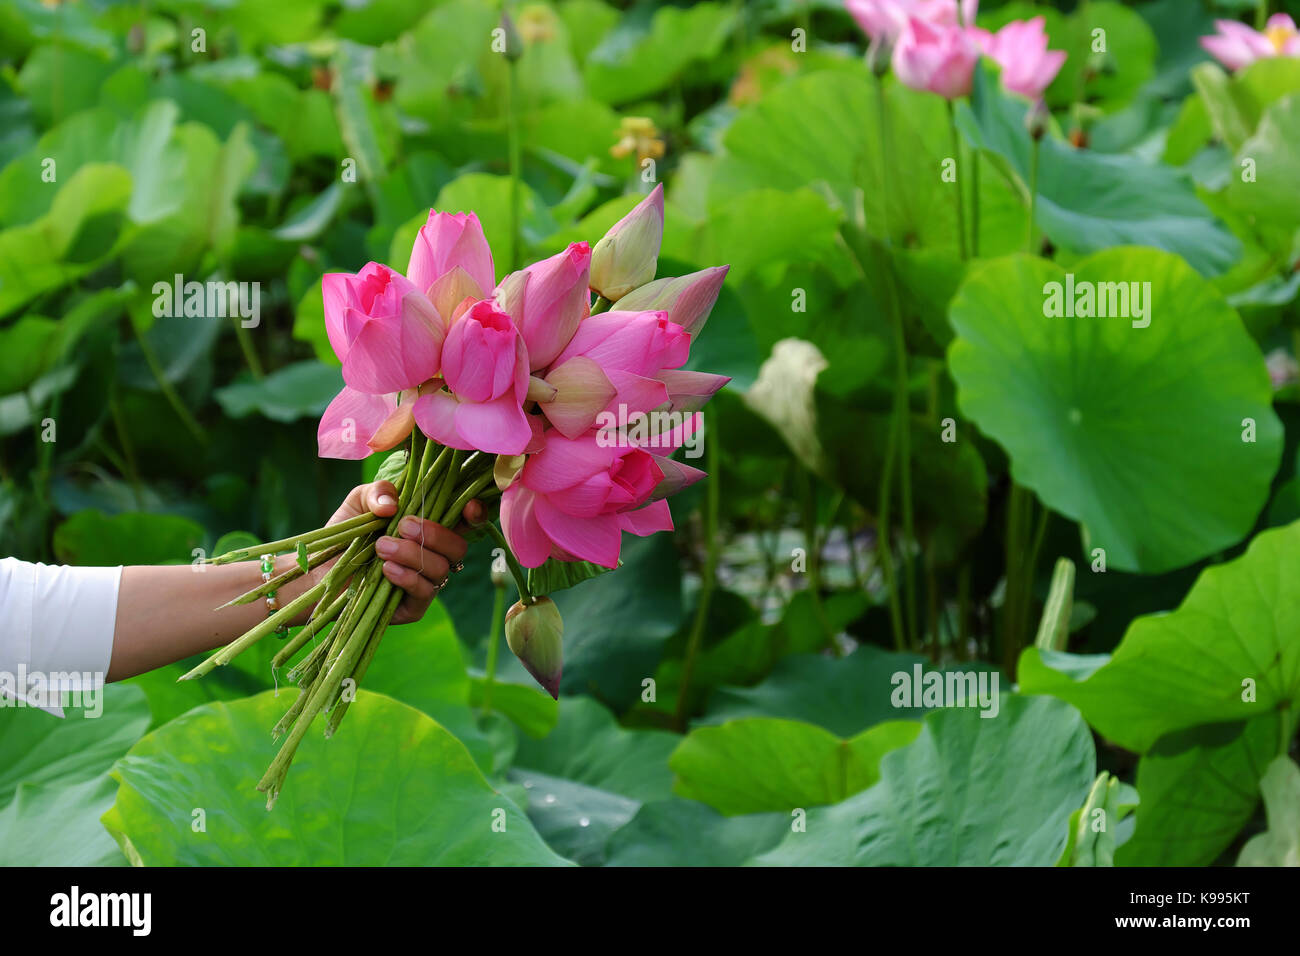 Bouquet Of Lotus Flowers Stock Photos Bouquet Of Lotus Flowers